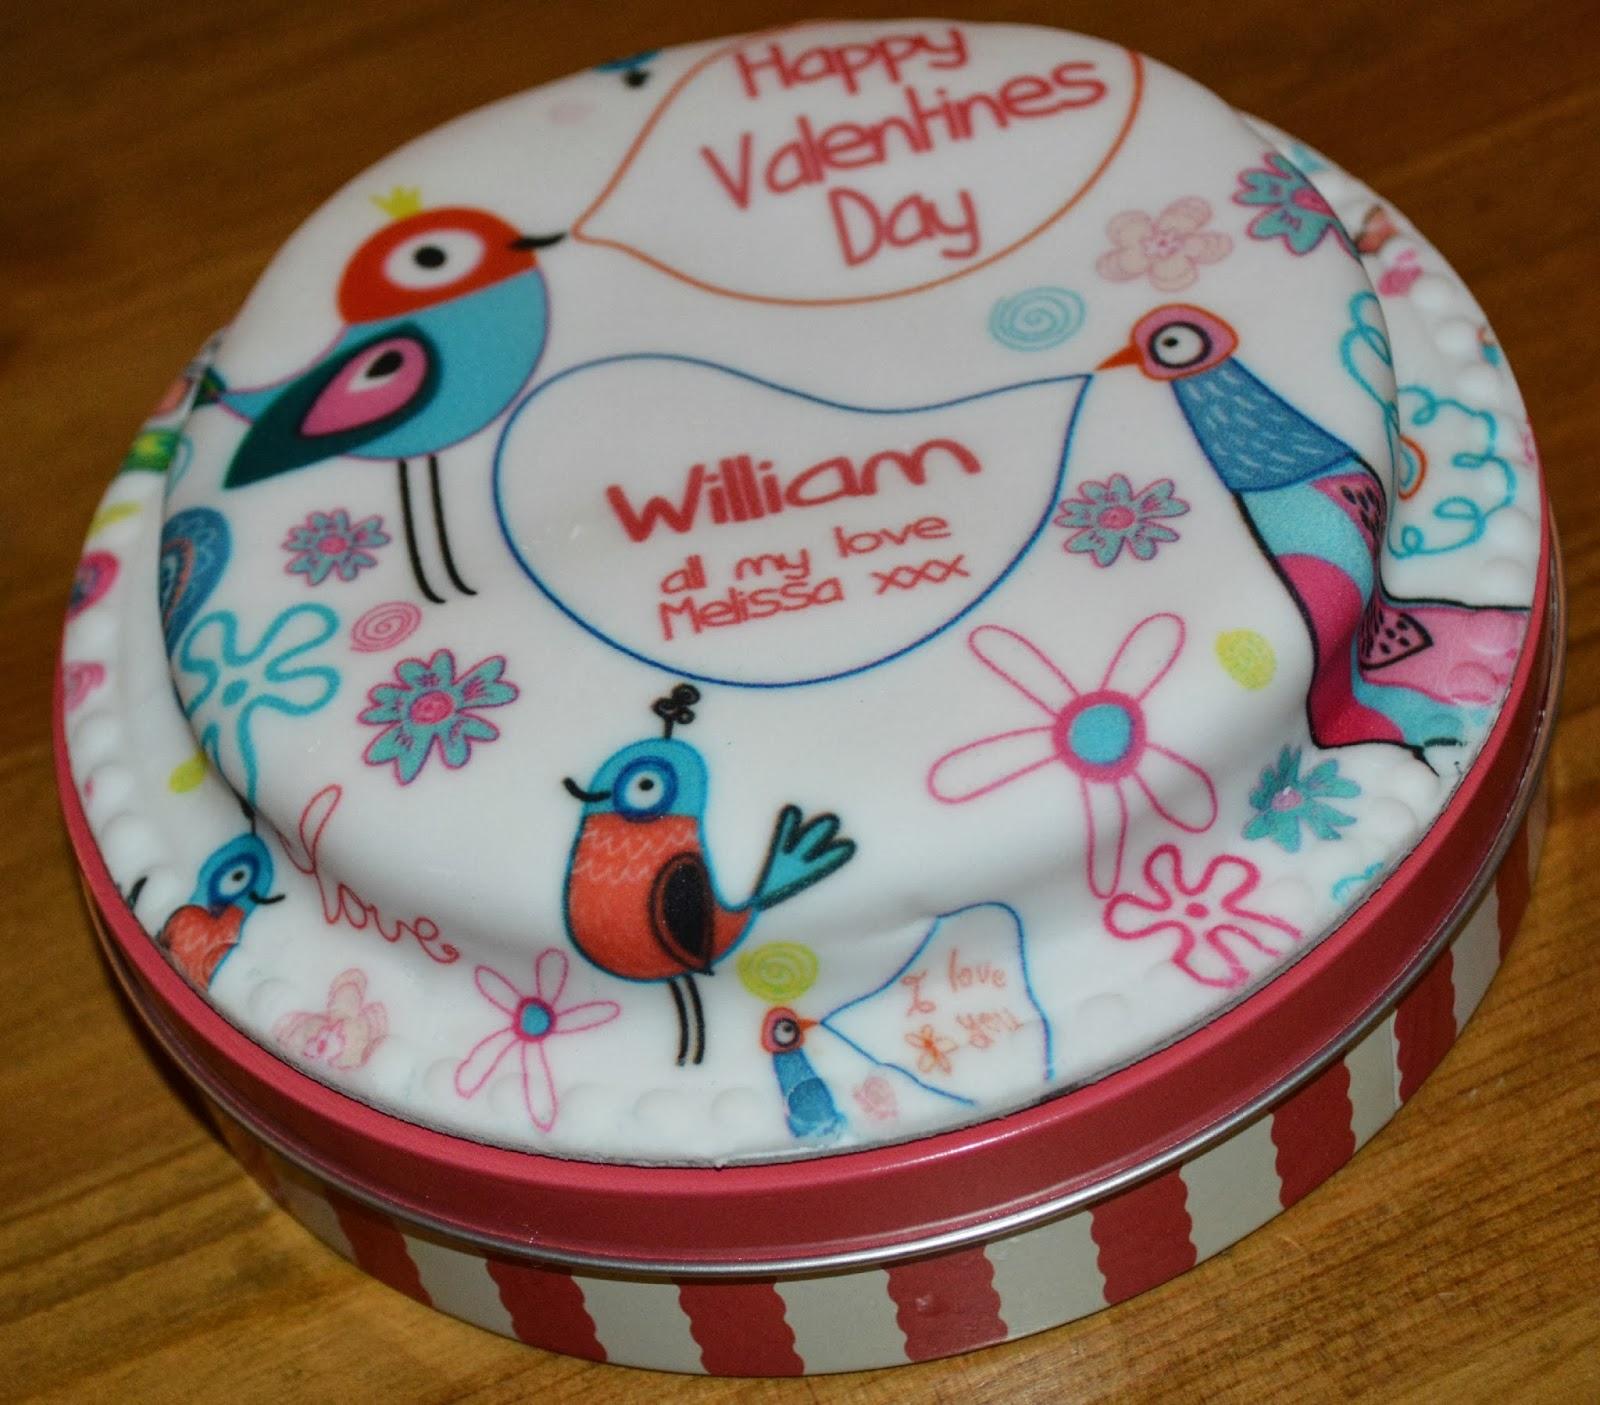 Mumma Melio Baker Days Letterbox Cakes Review